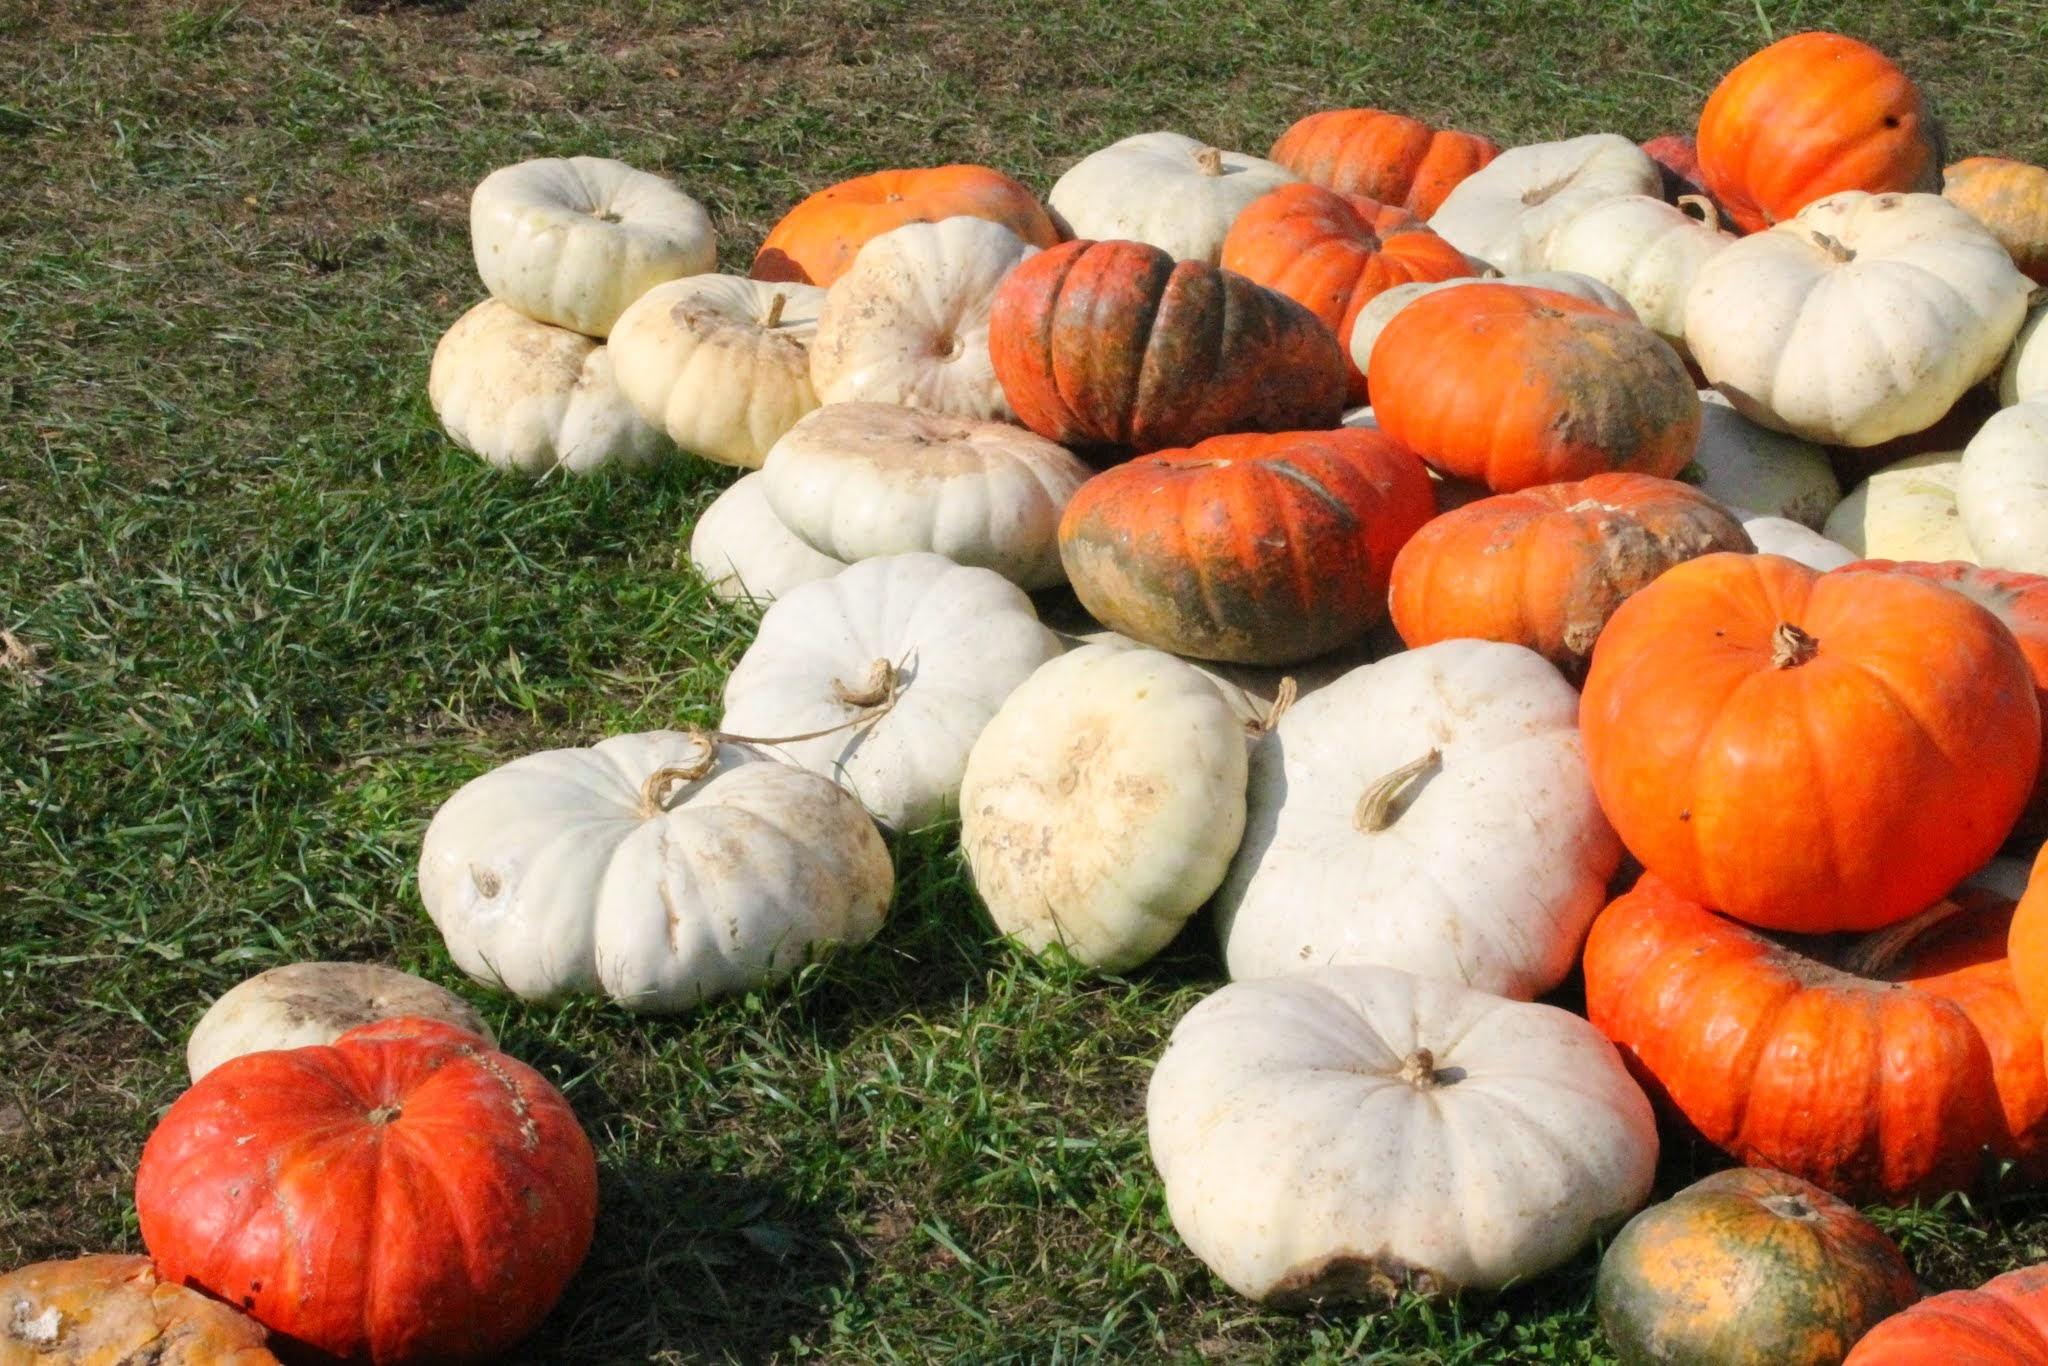 White orange and red Pumpkins. Kentucky.